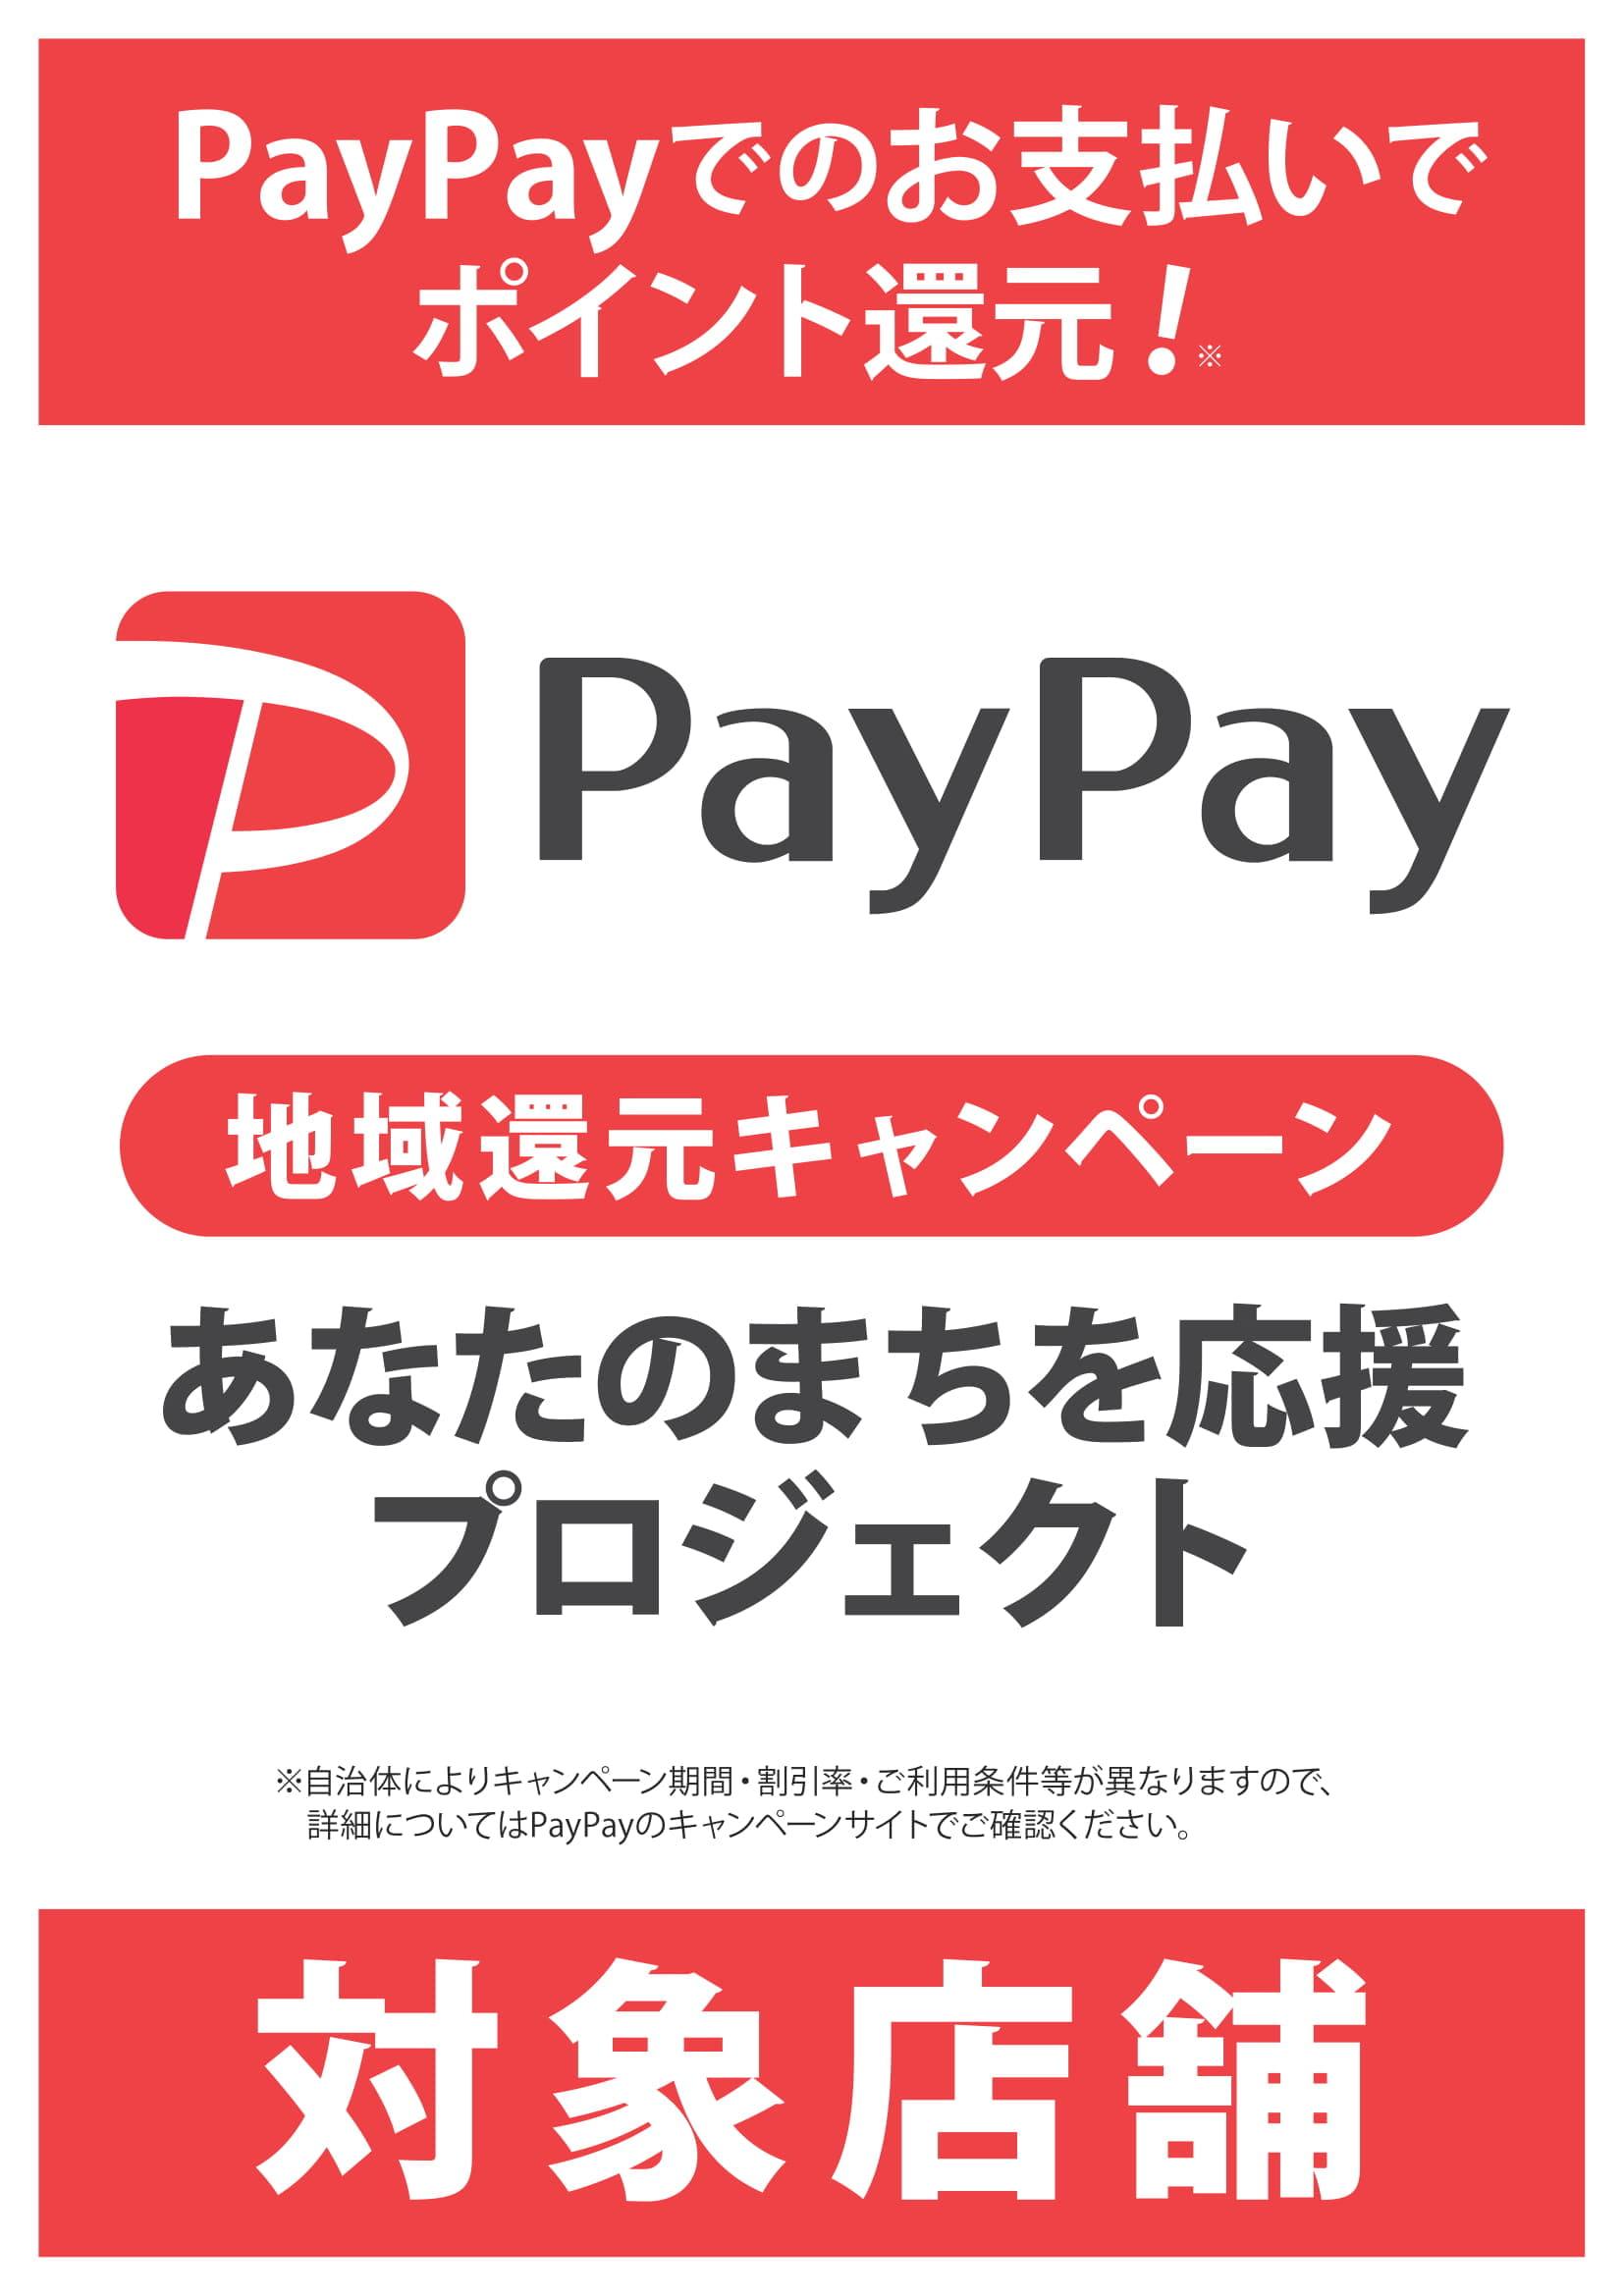 PayPay地域還元